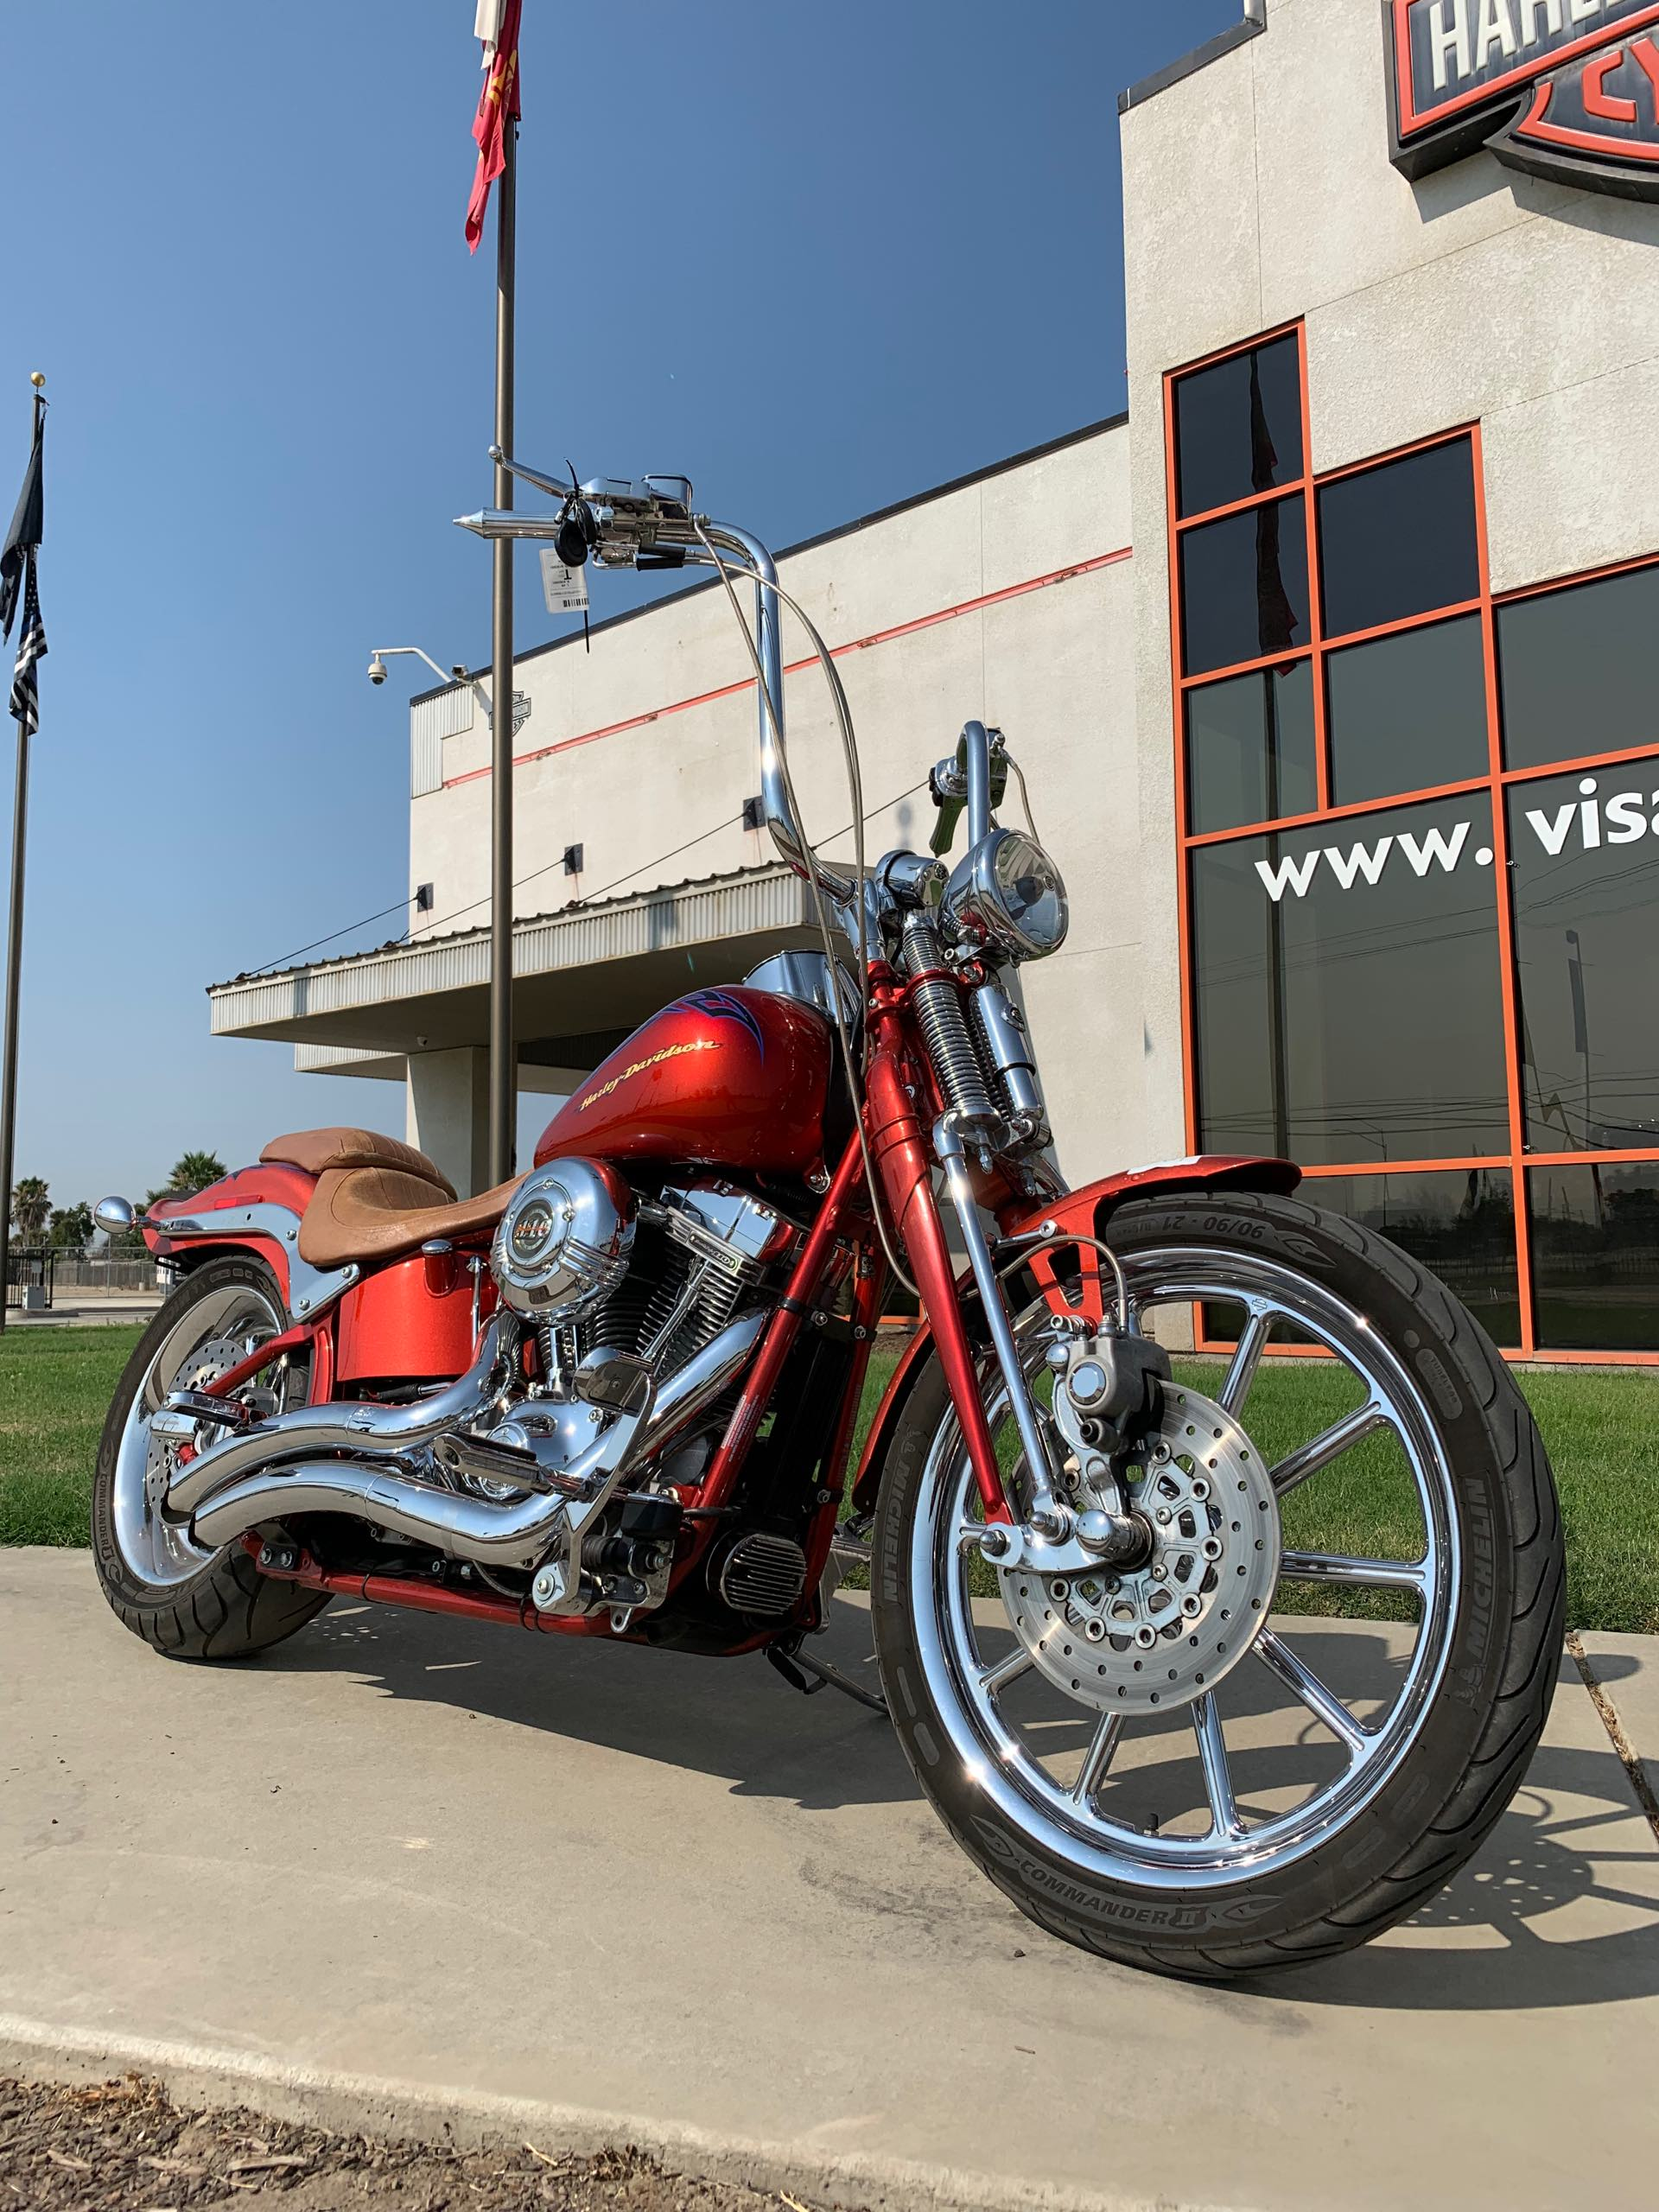 2007 Harley-Davidson FXSTSSE at Visalia Harley-Davidson